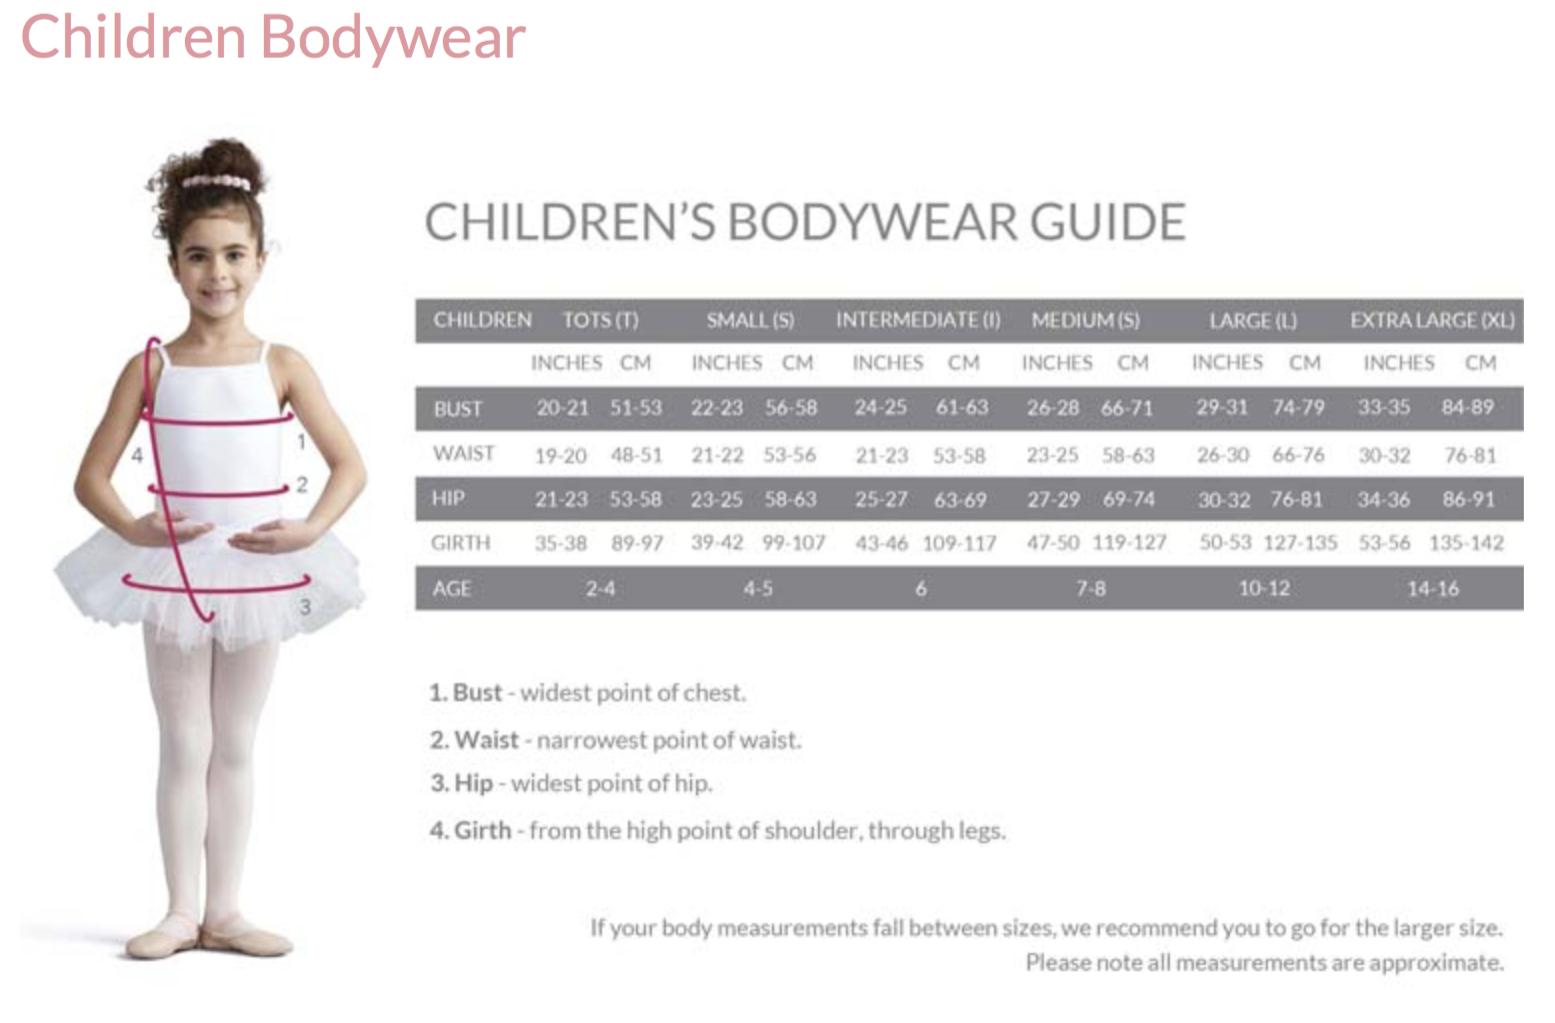 Children Bodywear Guide